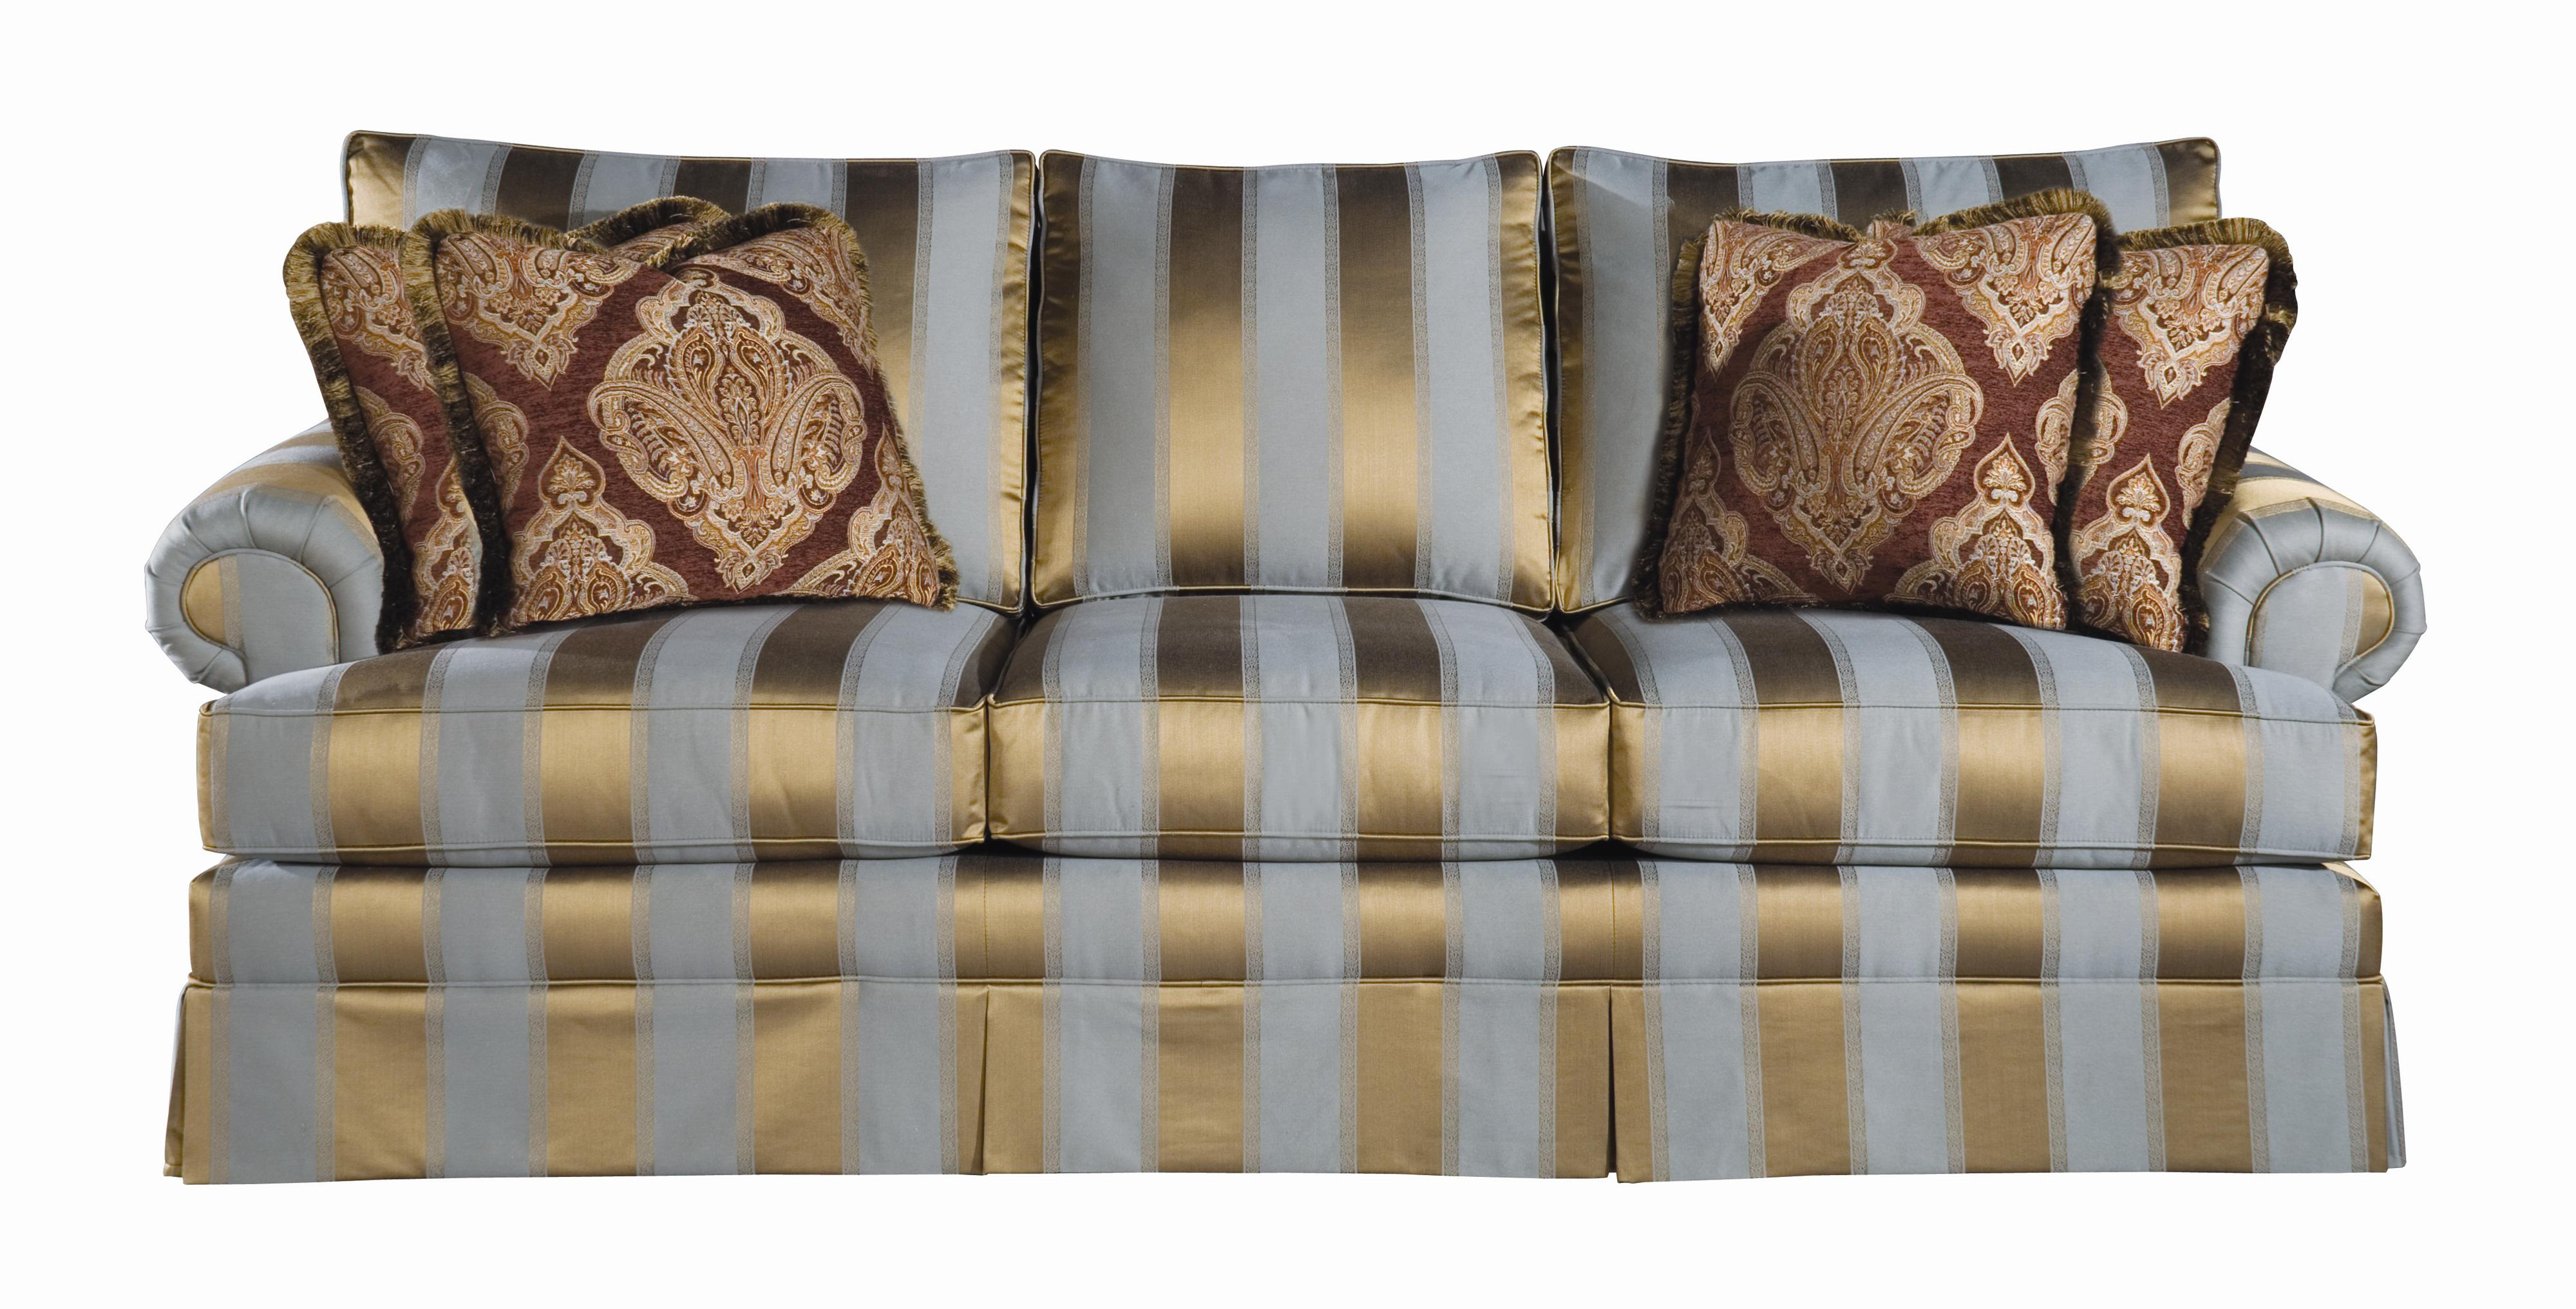 Custom Select Upholstery Custom Stationary Sofa by Kincaid Furniture at Johnny Janosik